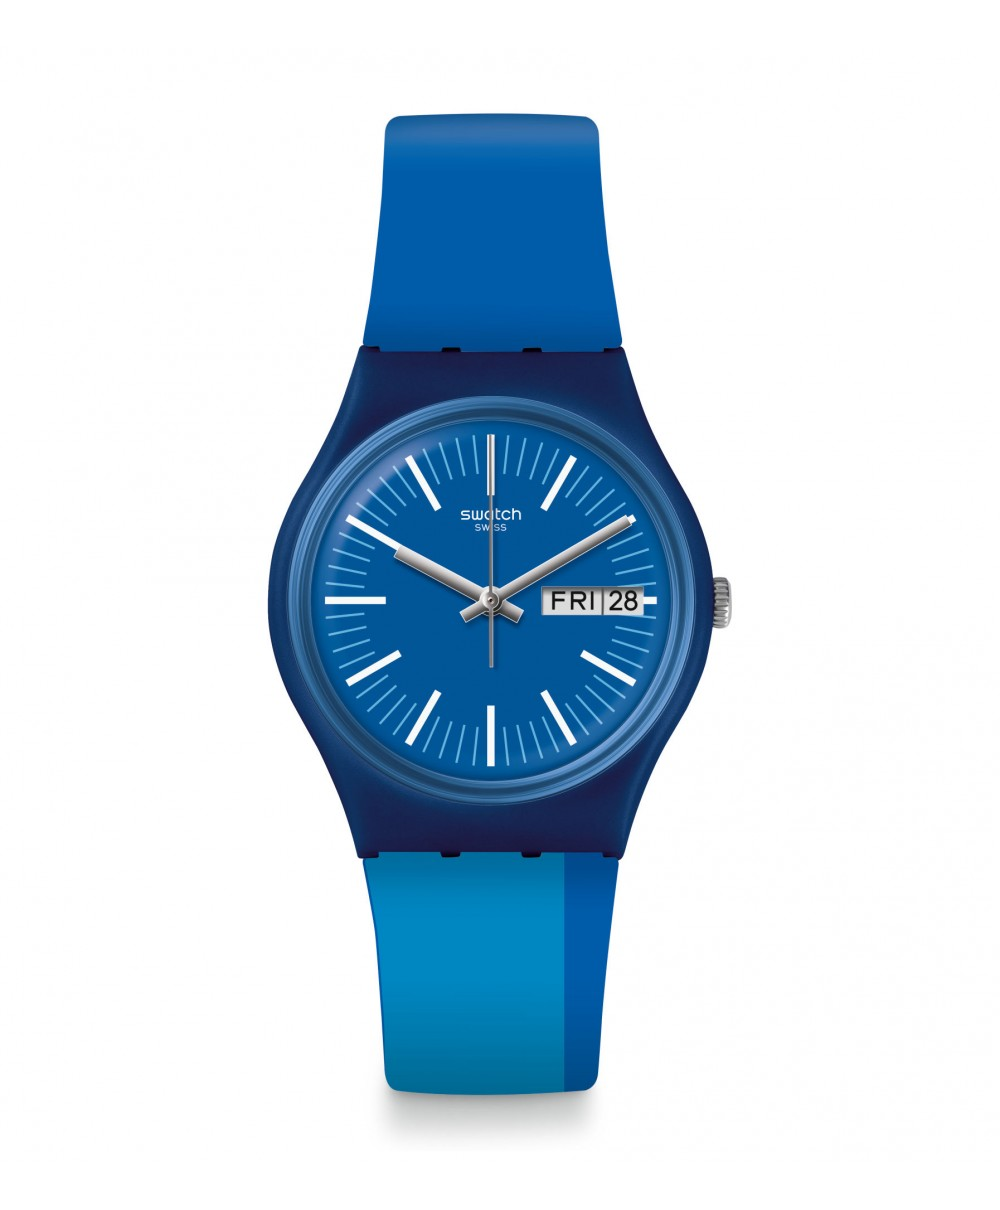 Reloj Swatch Tokyo 2020 Blue GZ708